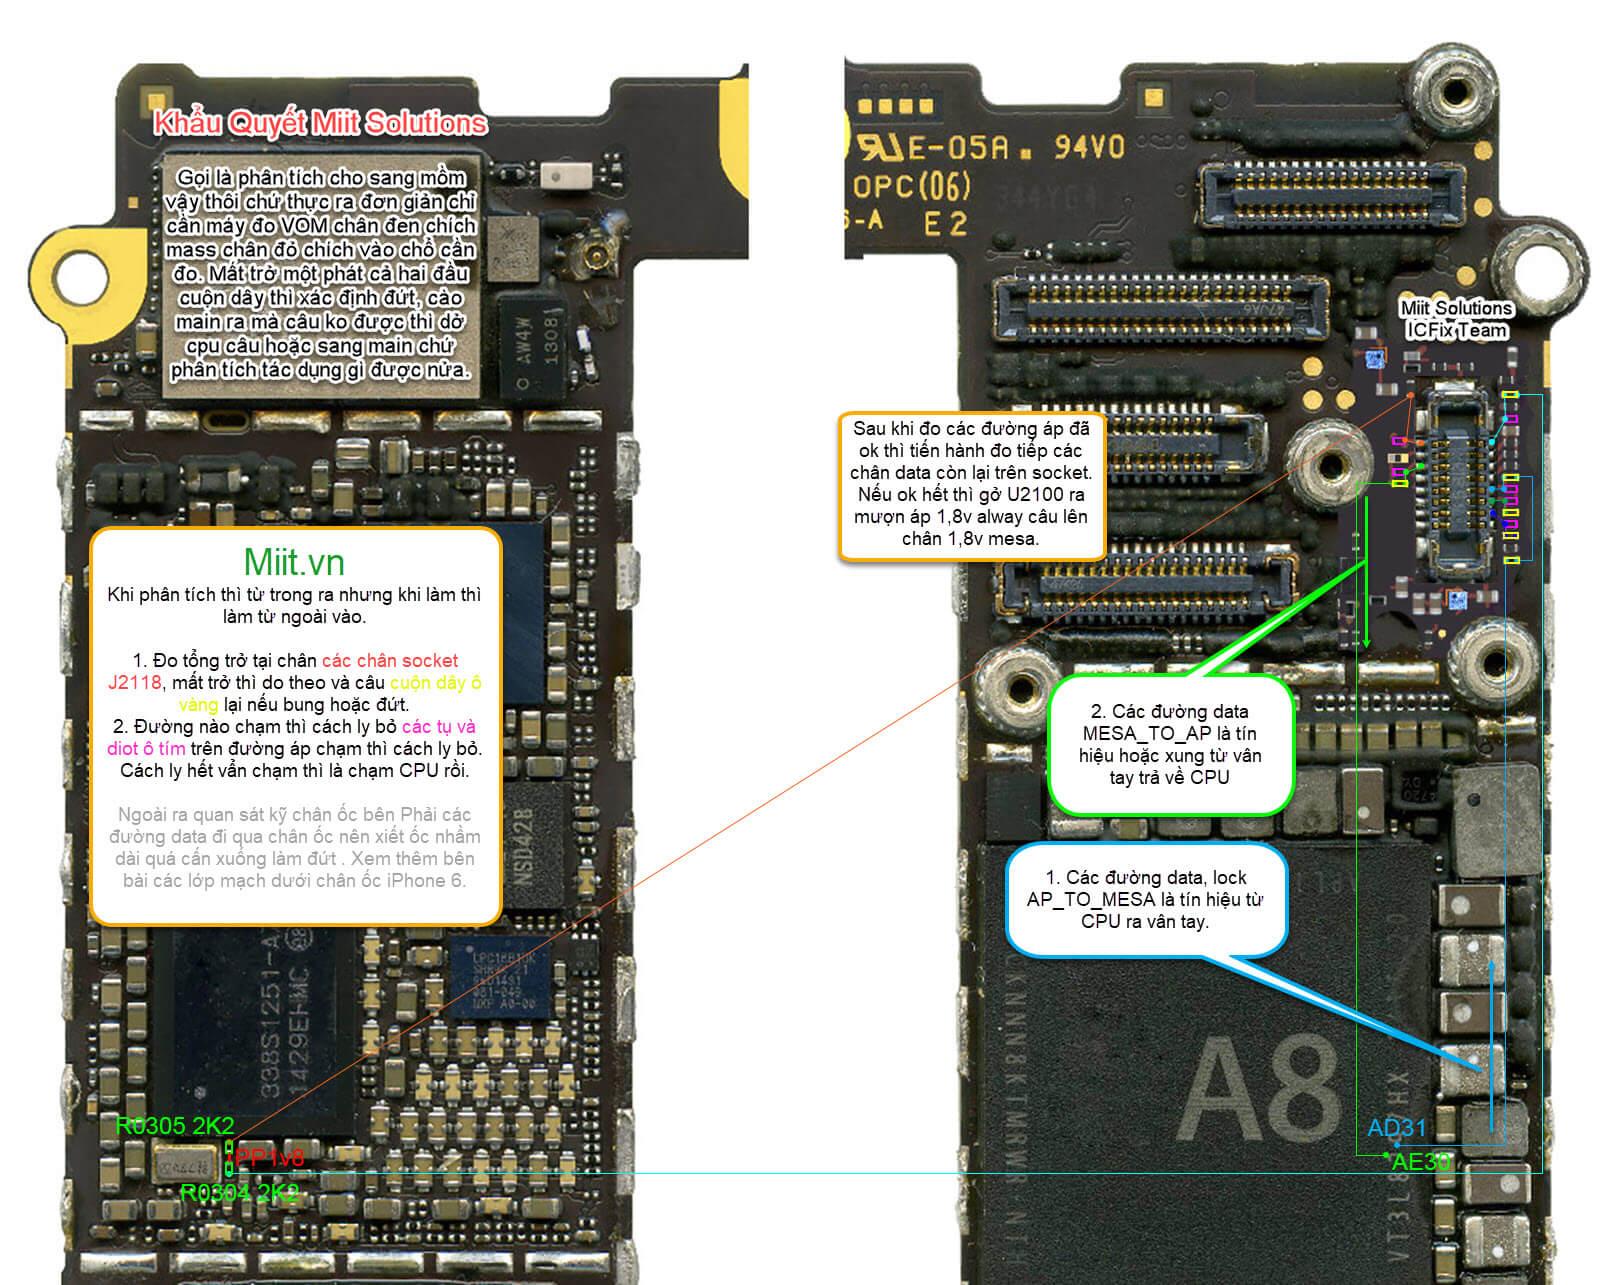 iPhone 6 Lỗi Vân Tay